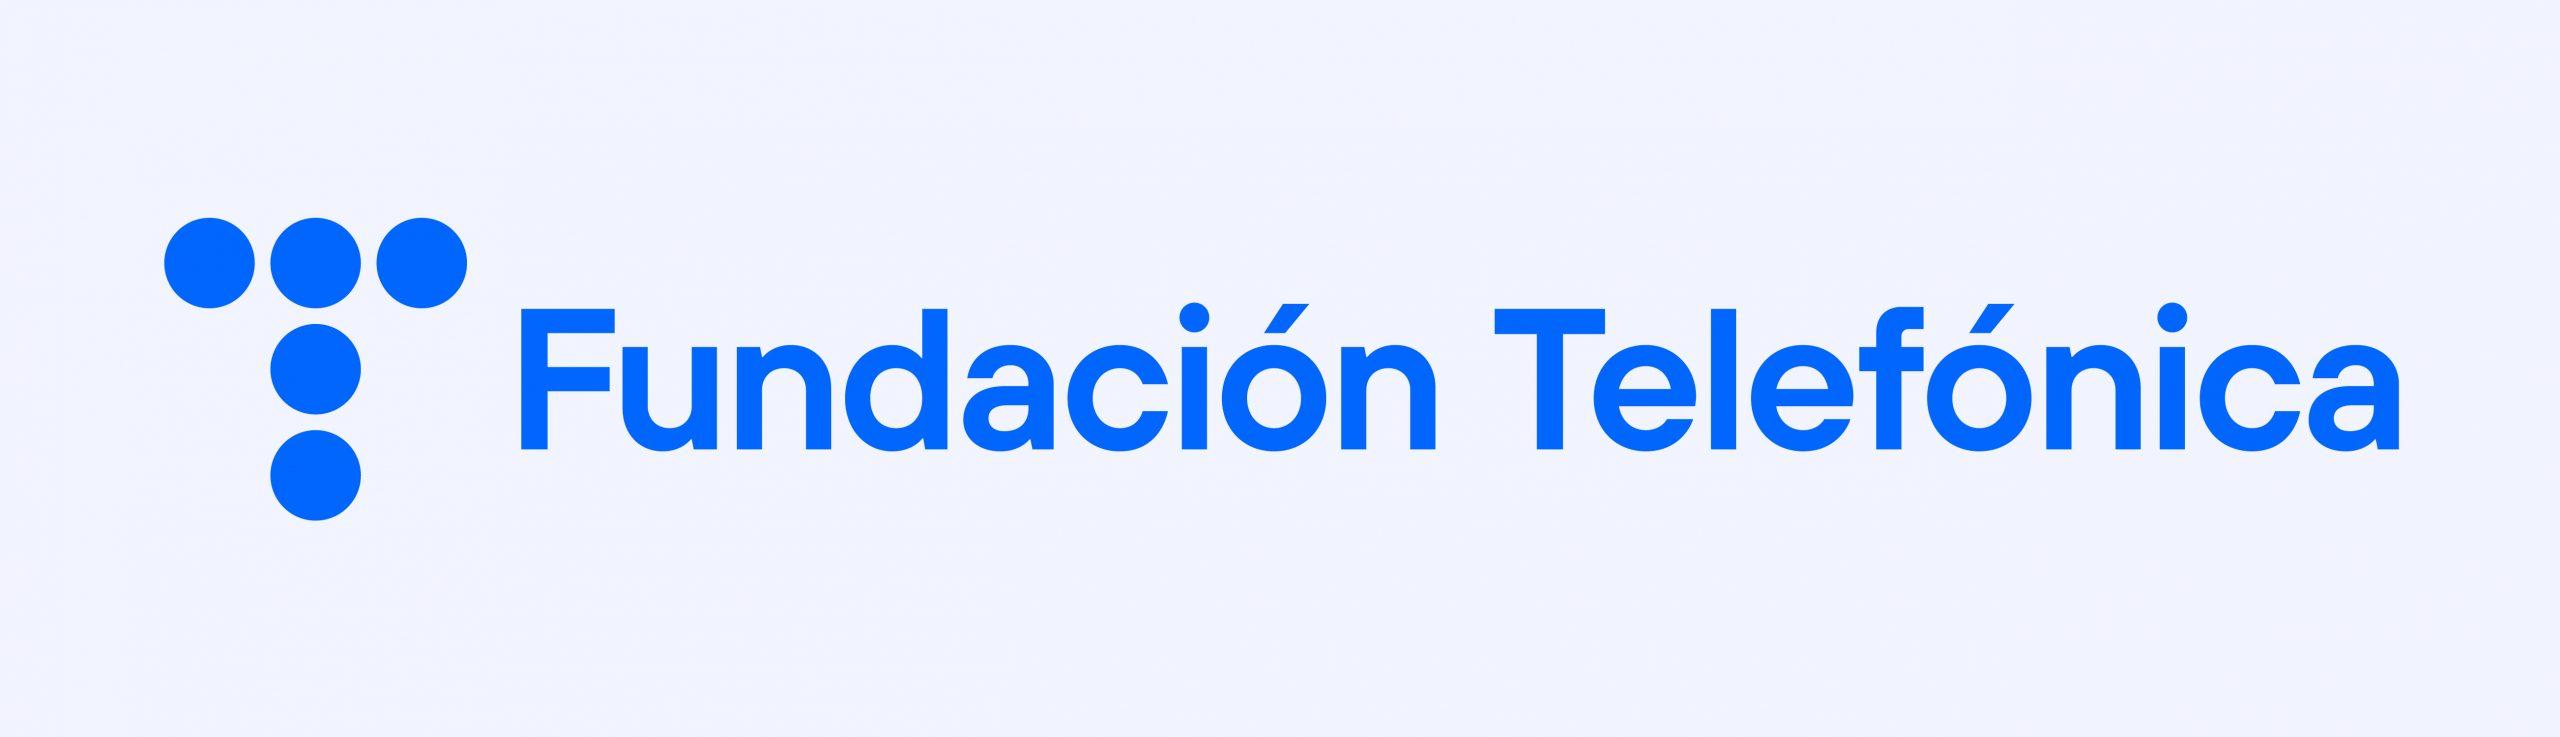 TEF-FUNDACION-LOGO-RGB_01